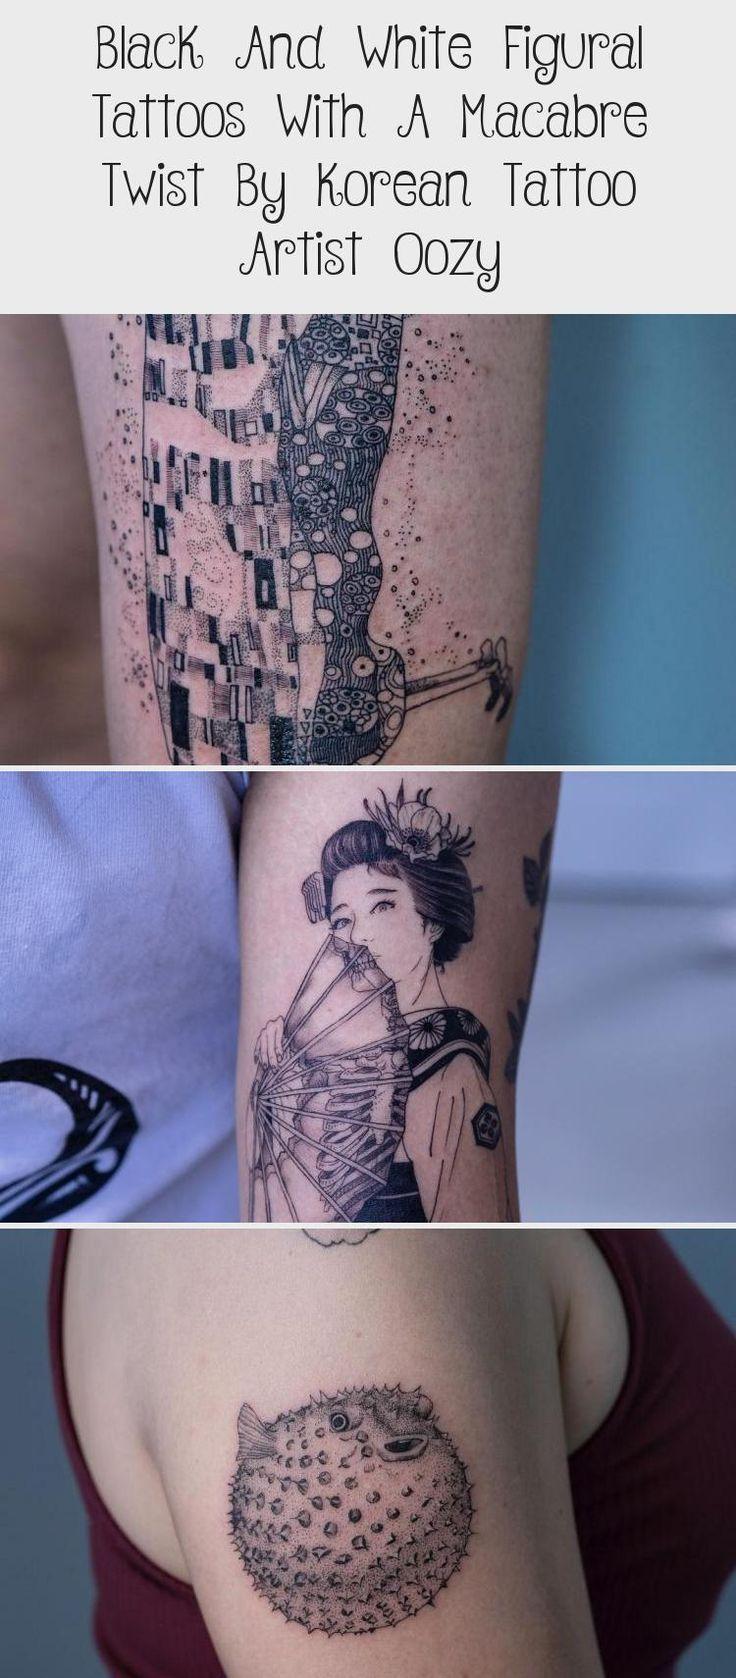 Tattoo Artists Korean Tattoo Ideas In 2020 Korean Tattoo Artist Korean Tattoos Tattoo Artists